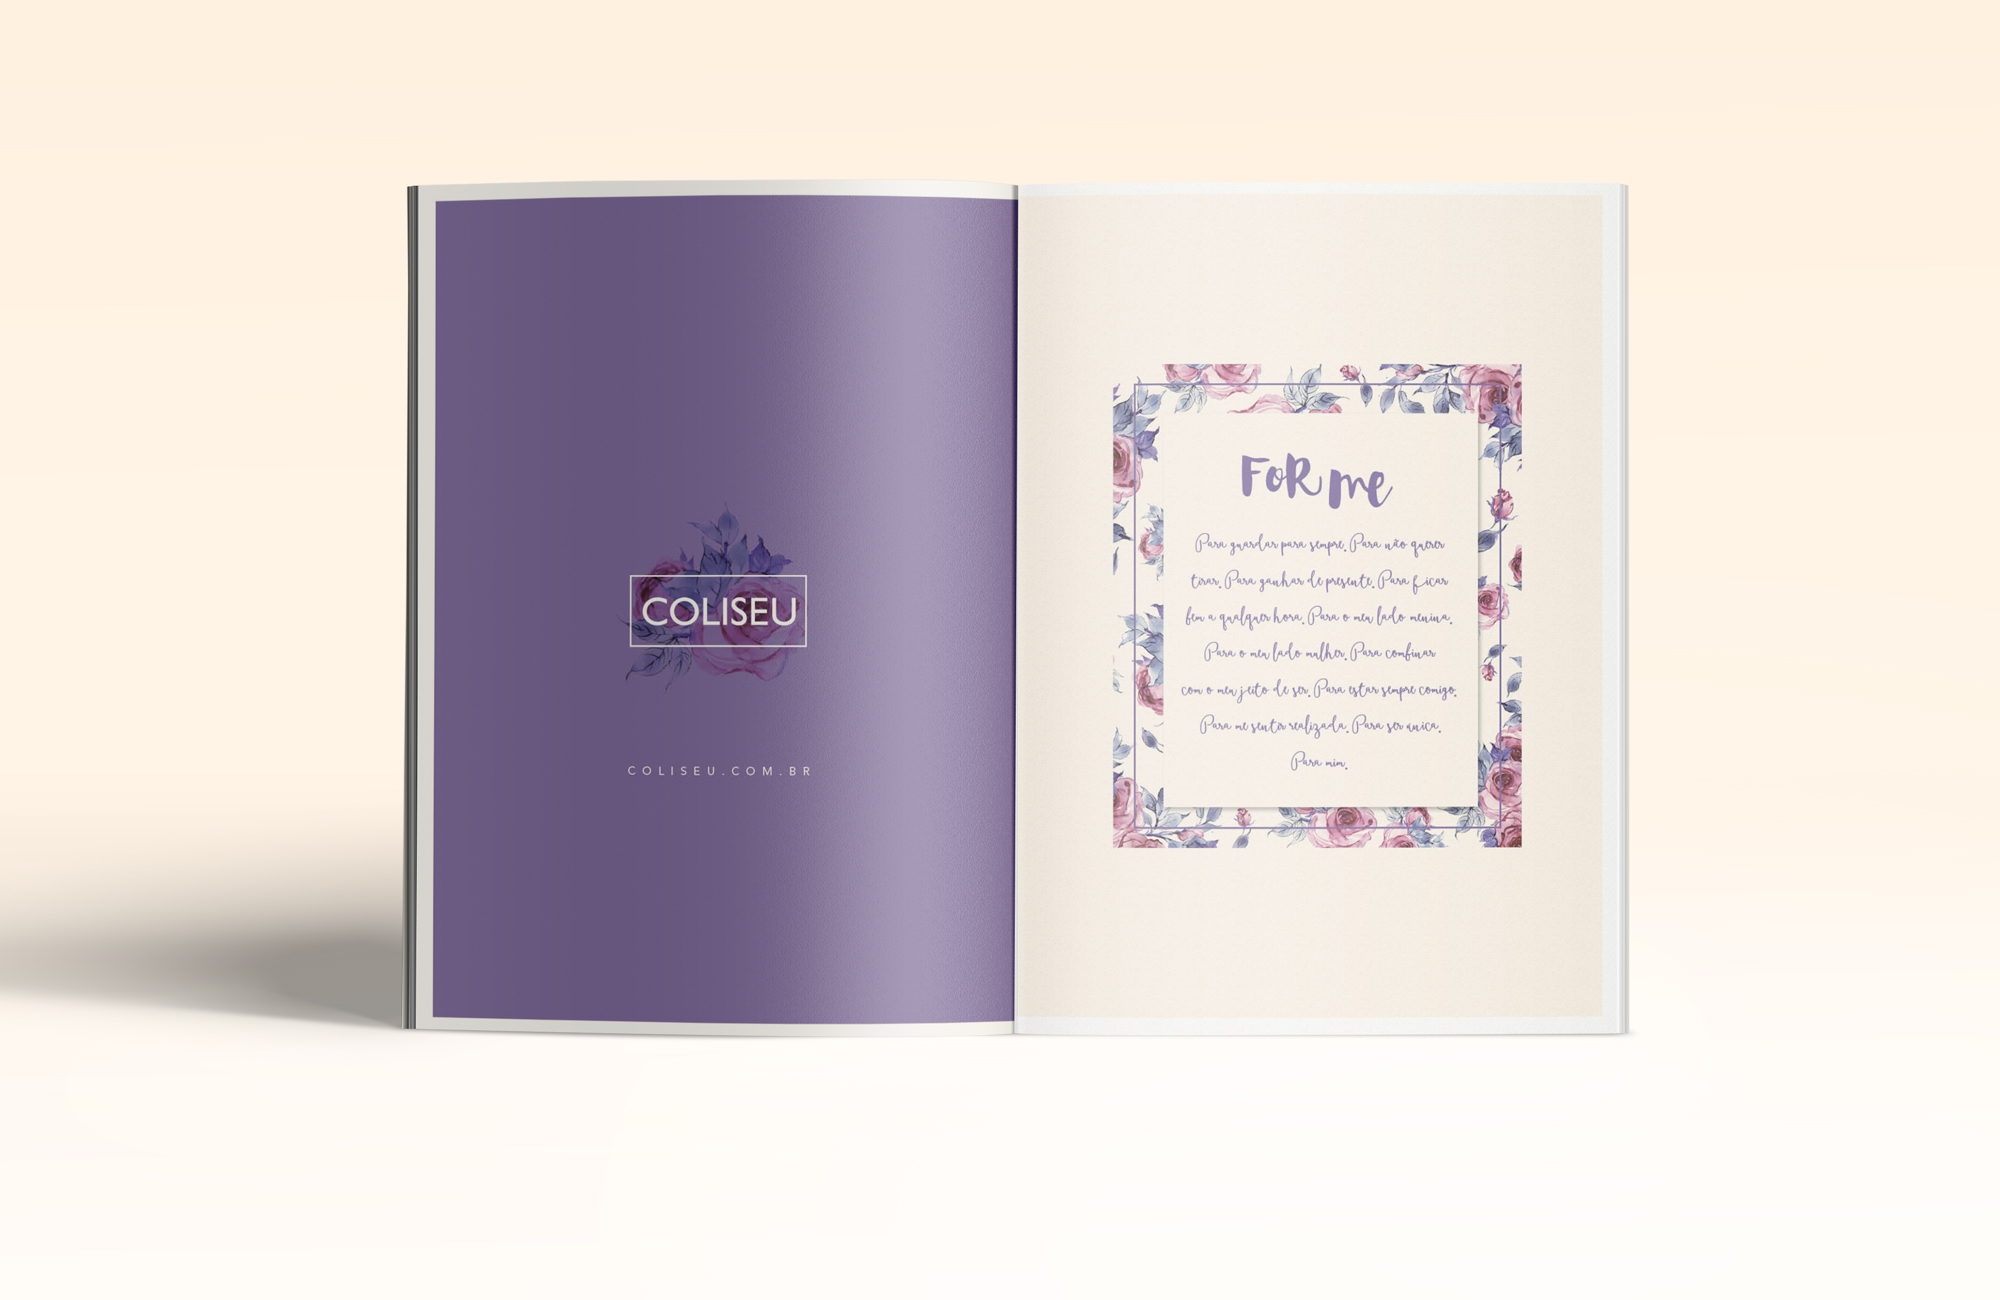 COLISEU FOR ME